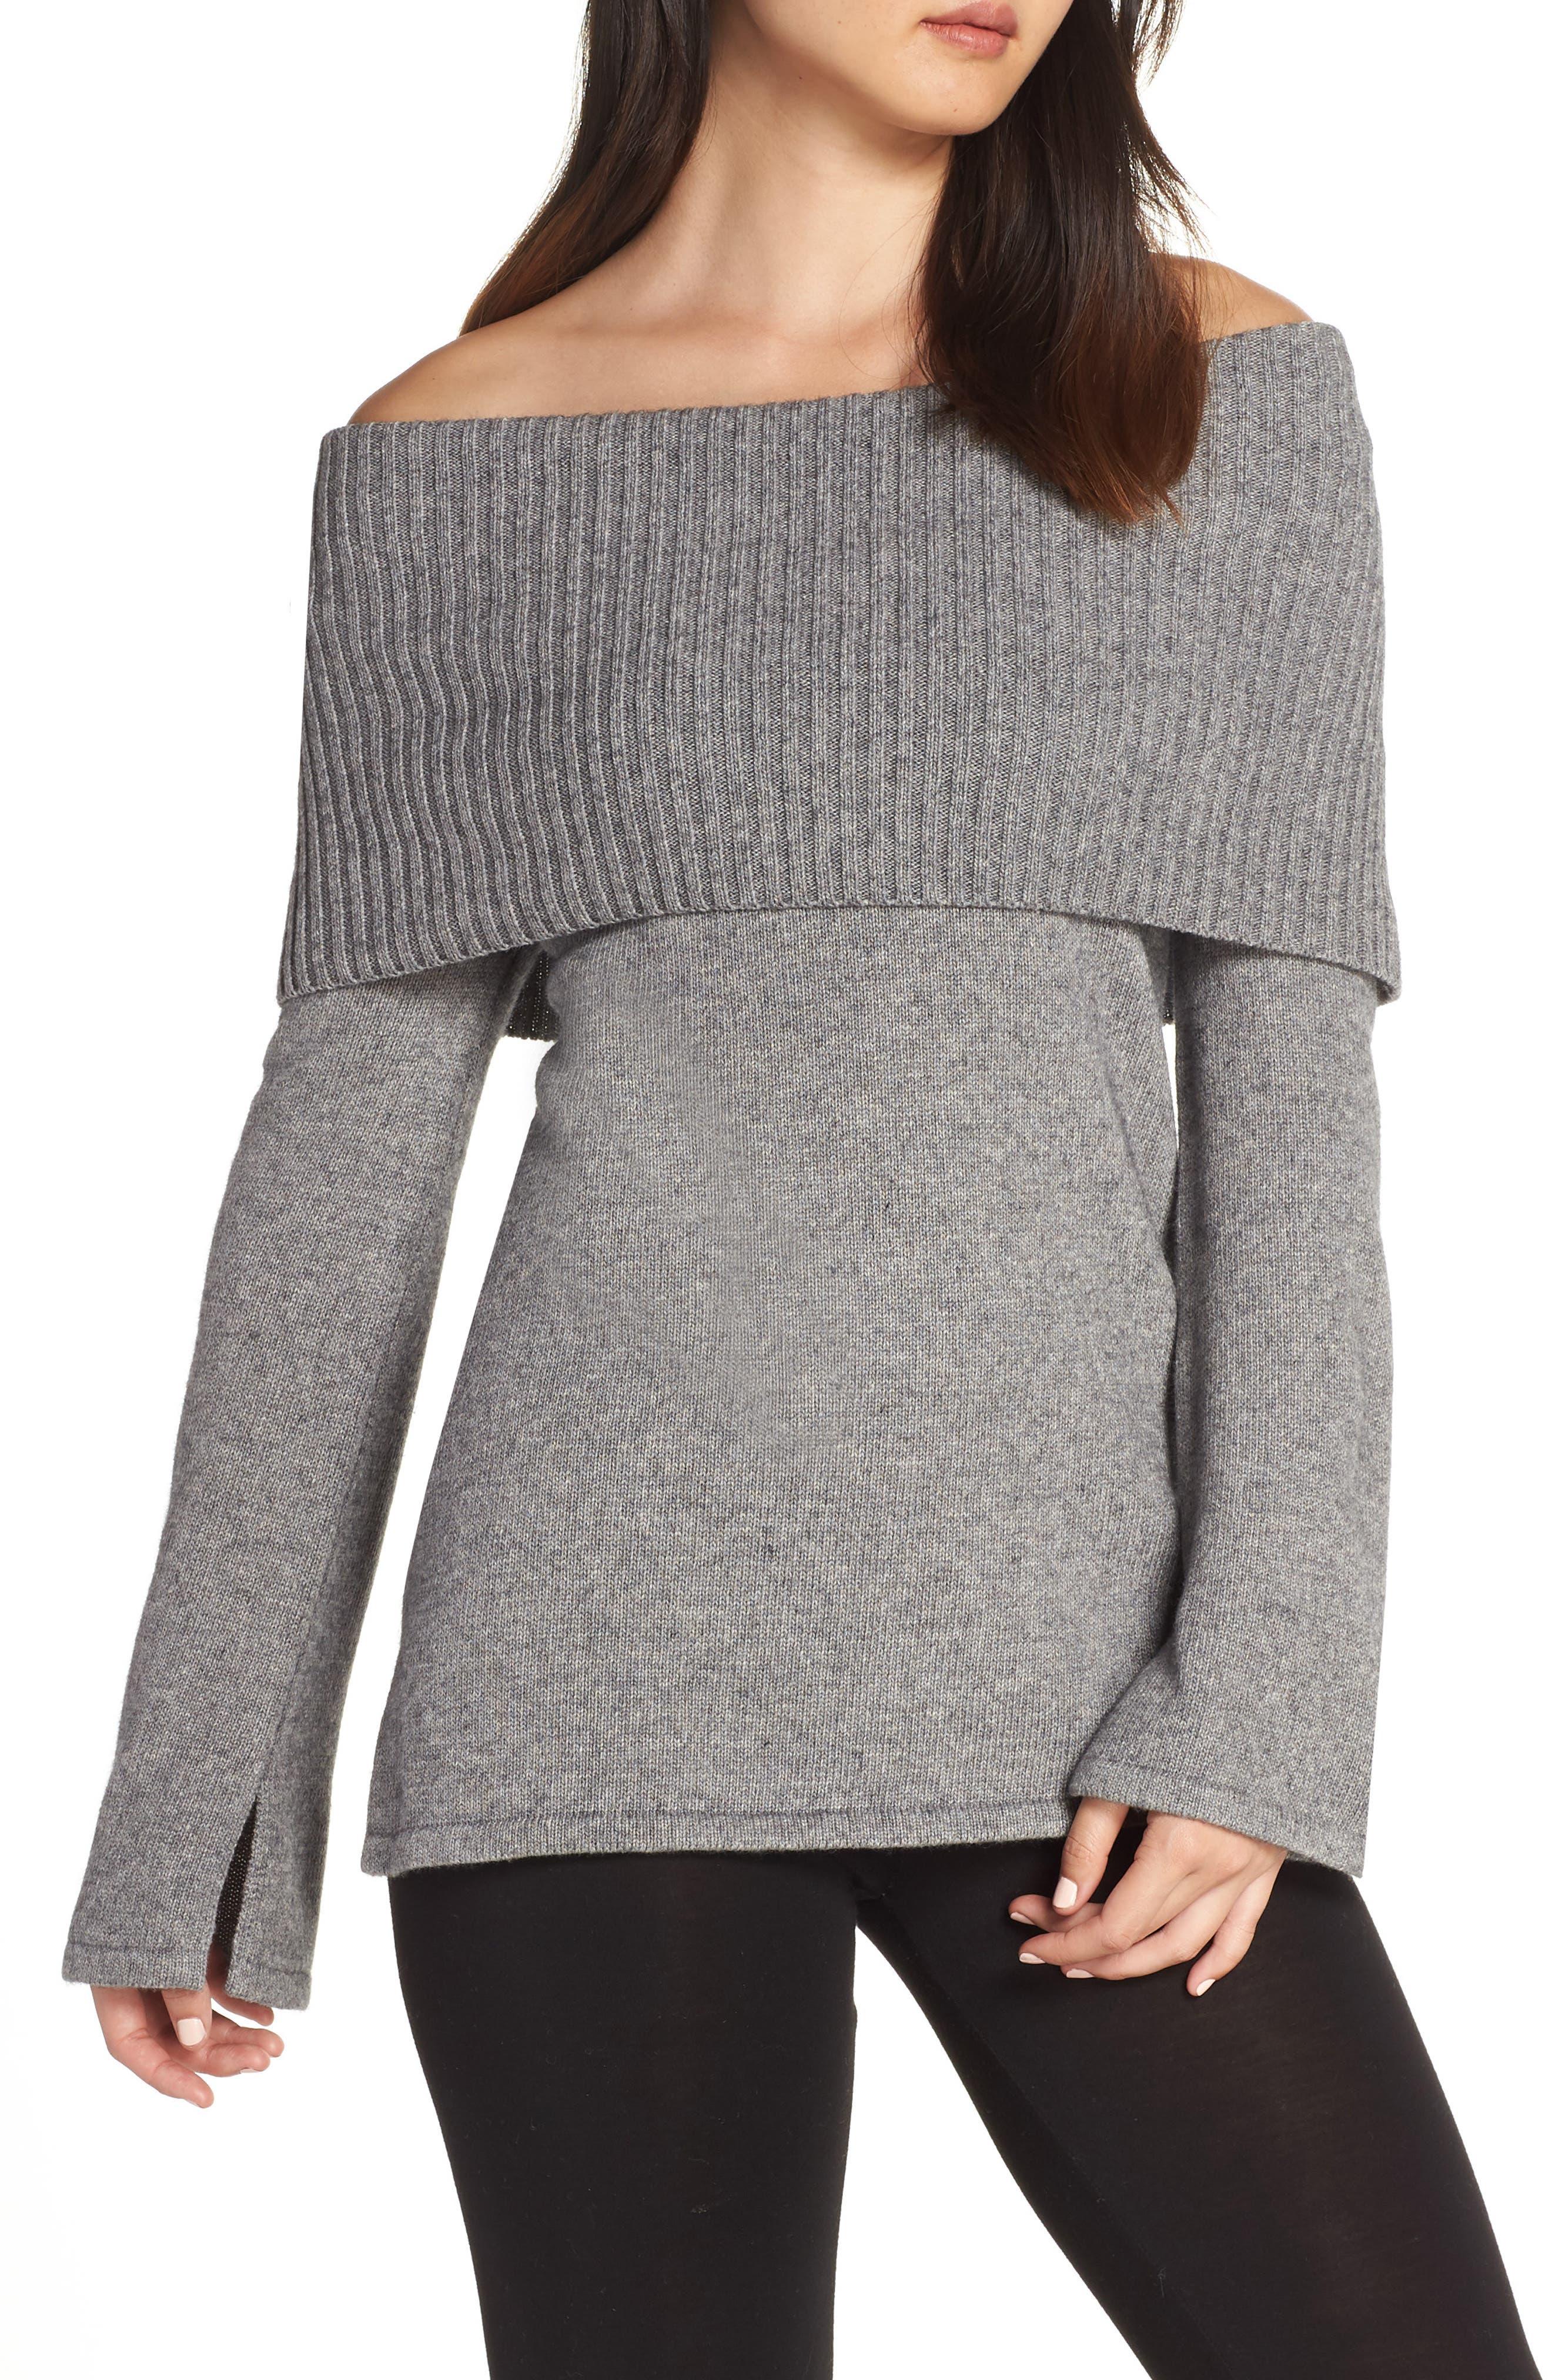 Rhodyn Off The Shoulder Sweater,                         Main,                         color, GREY HEATHER